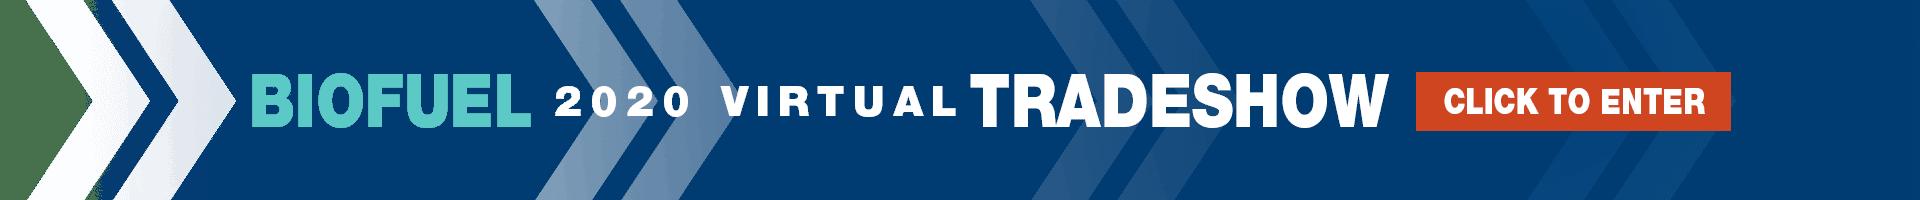 ad virtual tradeshow BioFuel